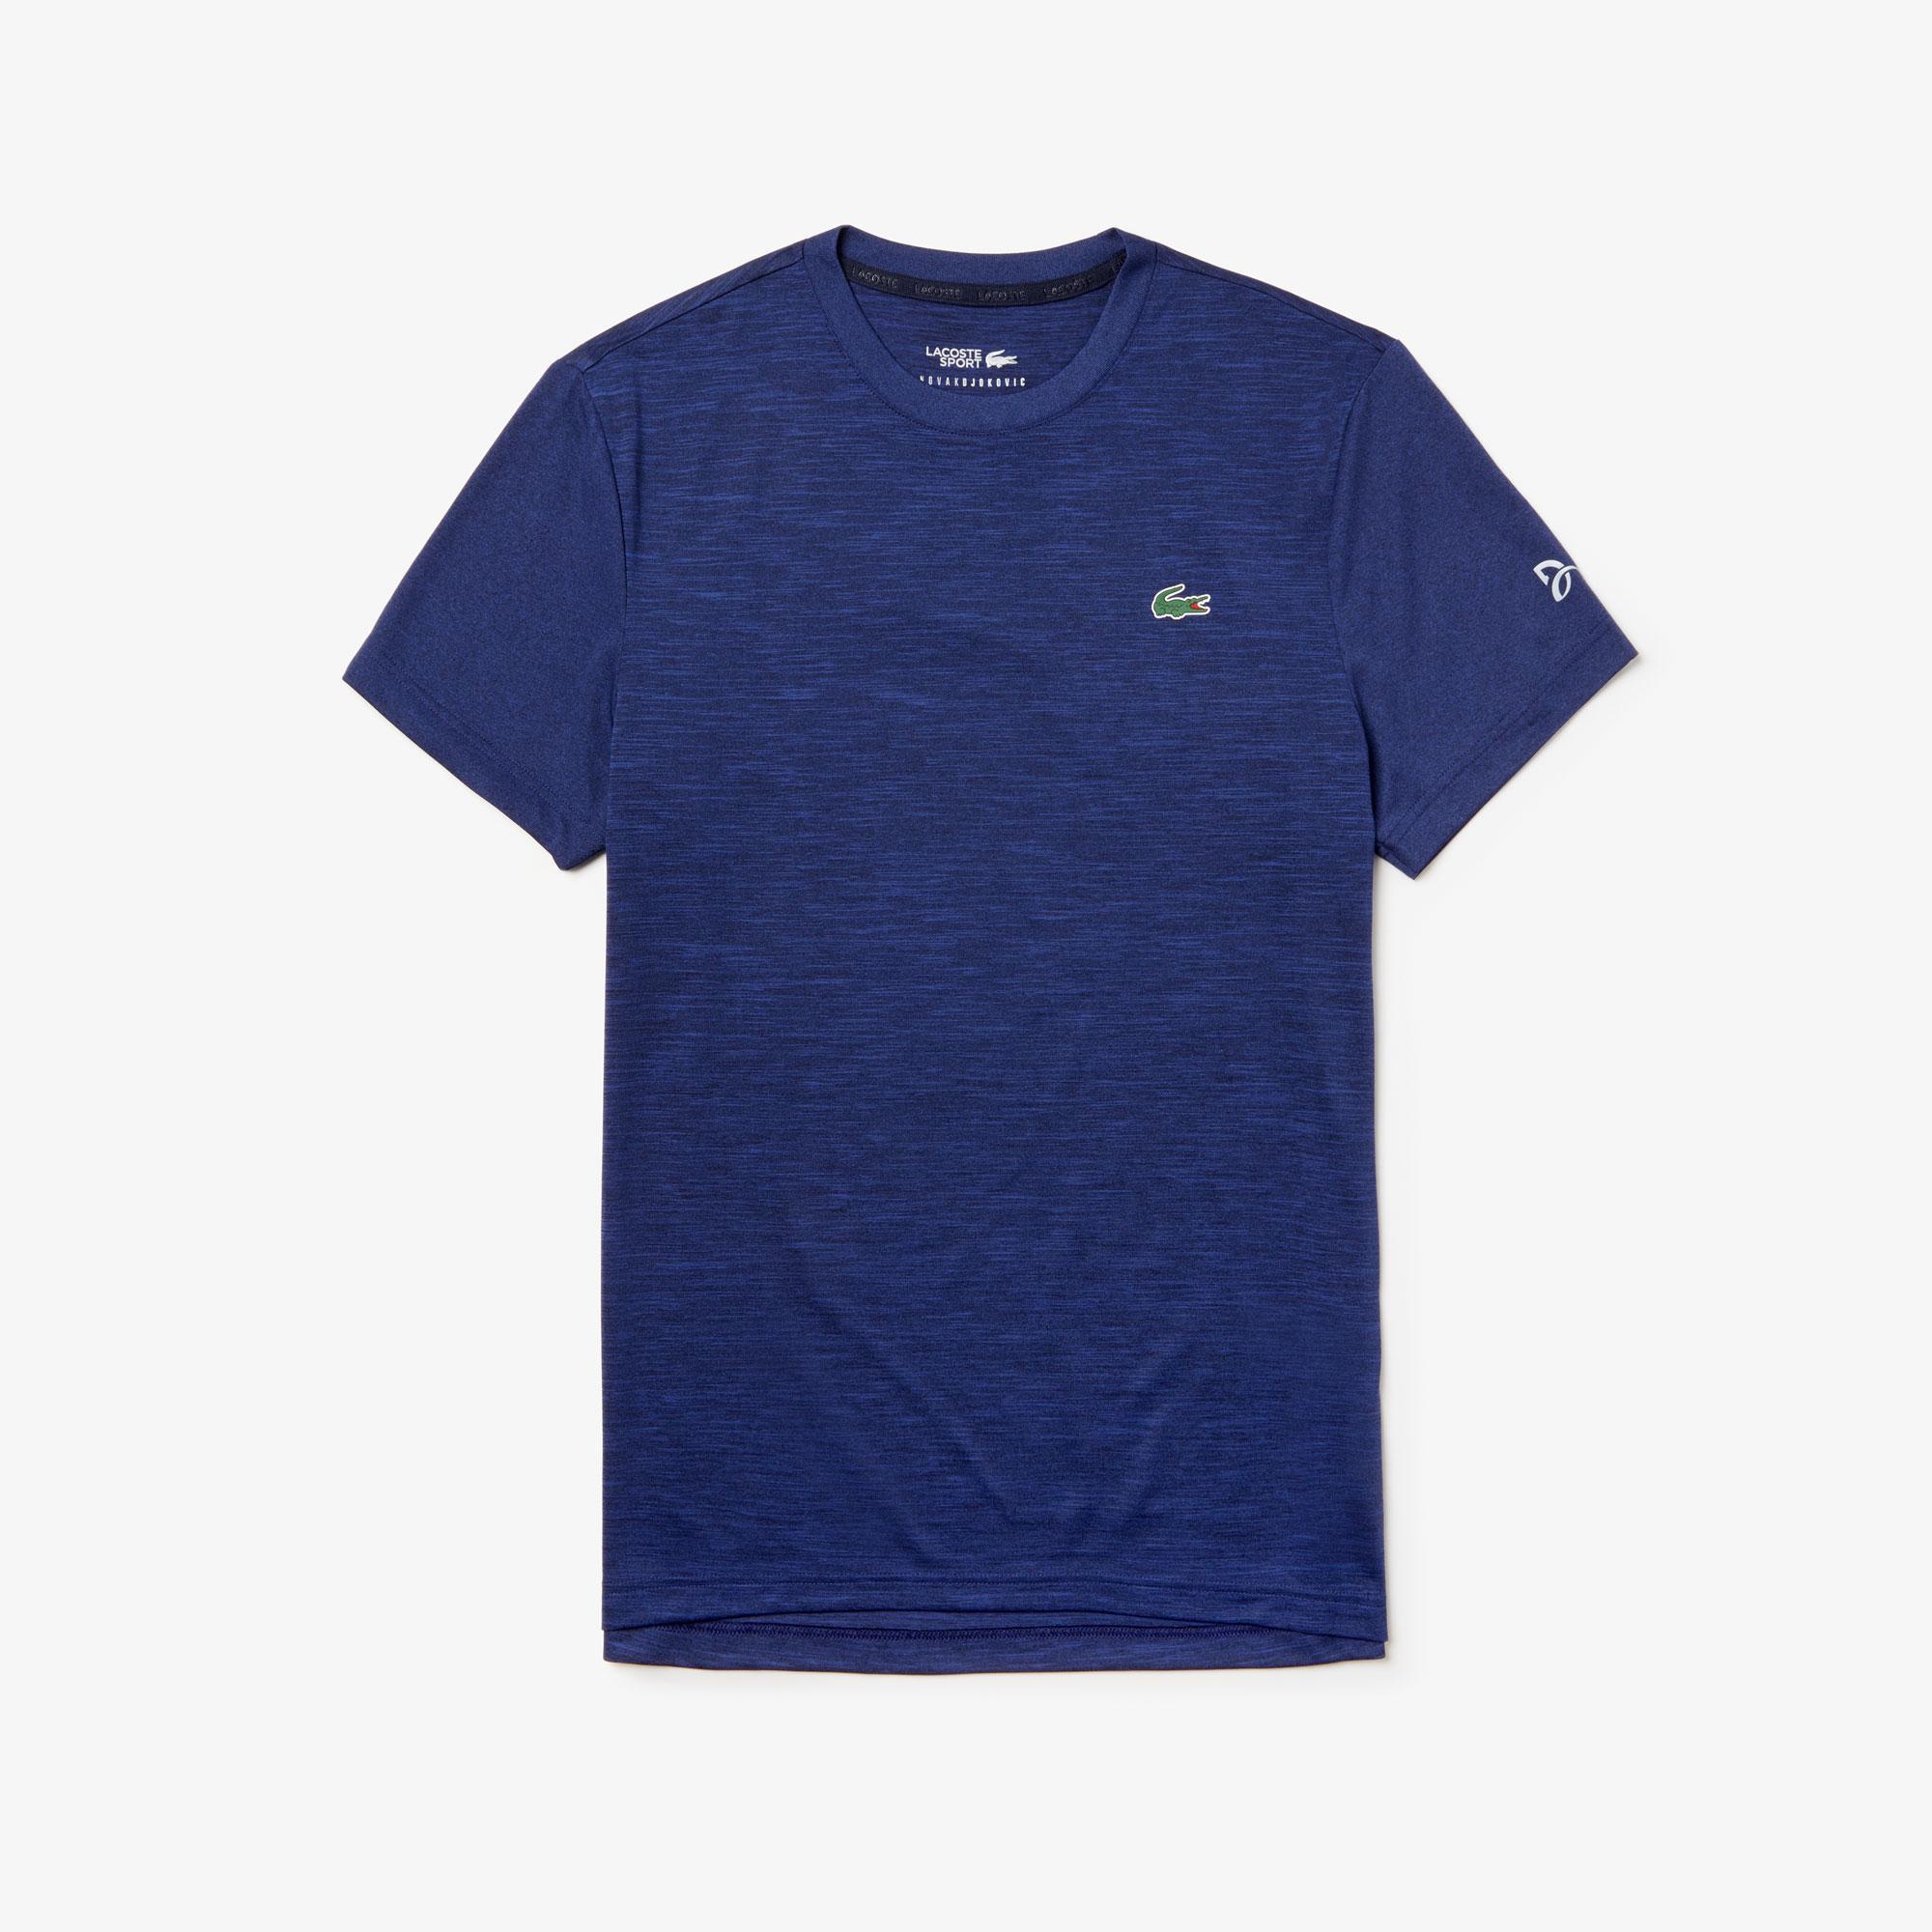 Lacoste Sport Men's X Novak Djokovic Heathered Tech Jersey T-Shirt